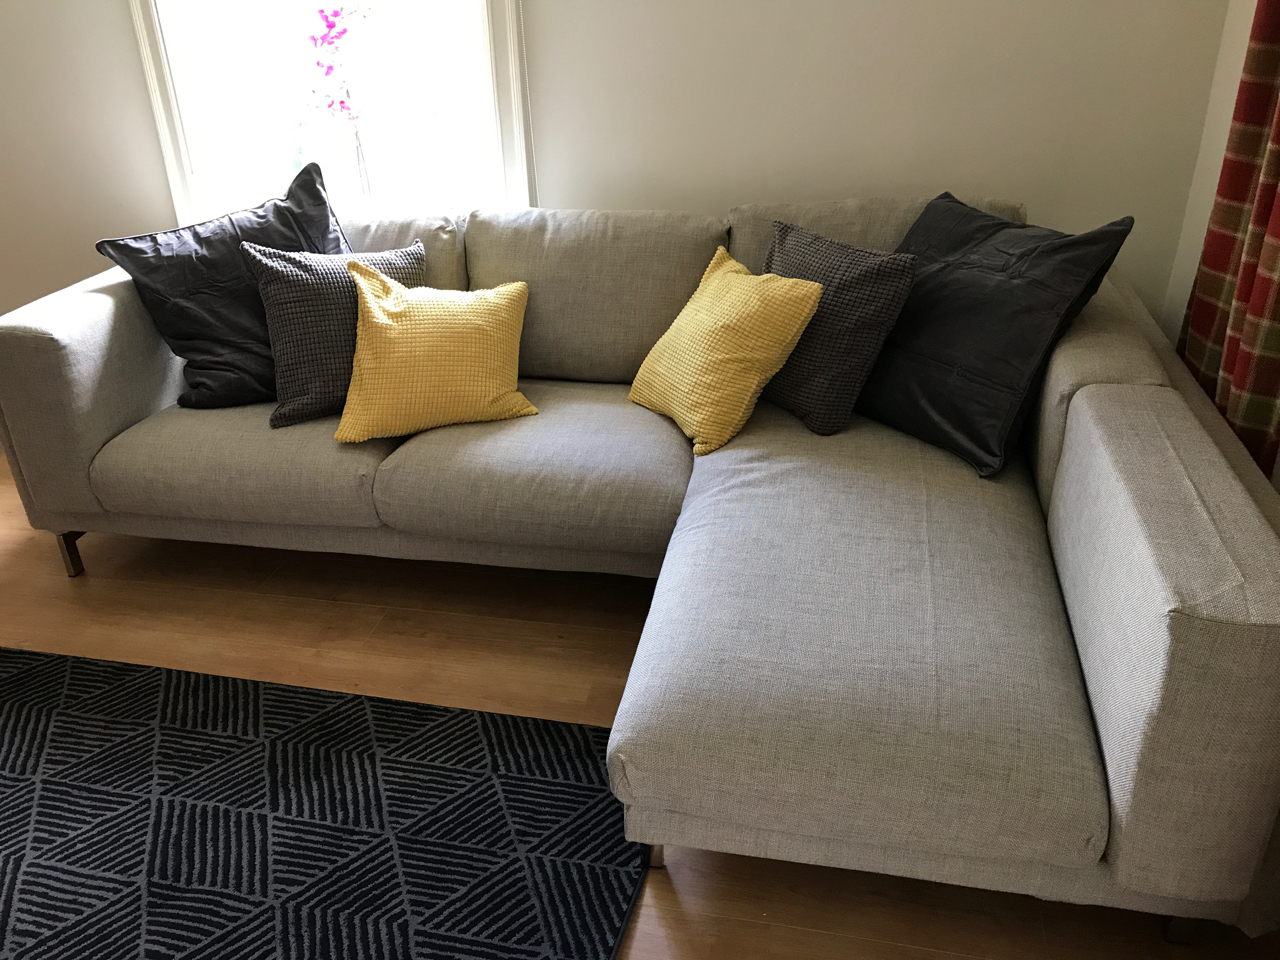 Ikea sofa North Norfolk assembled by www.norwichflatpack.co.uk